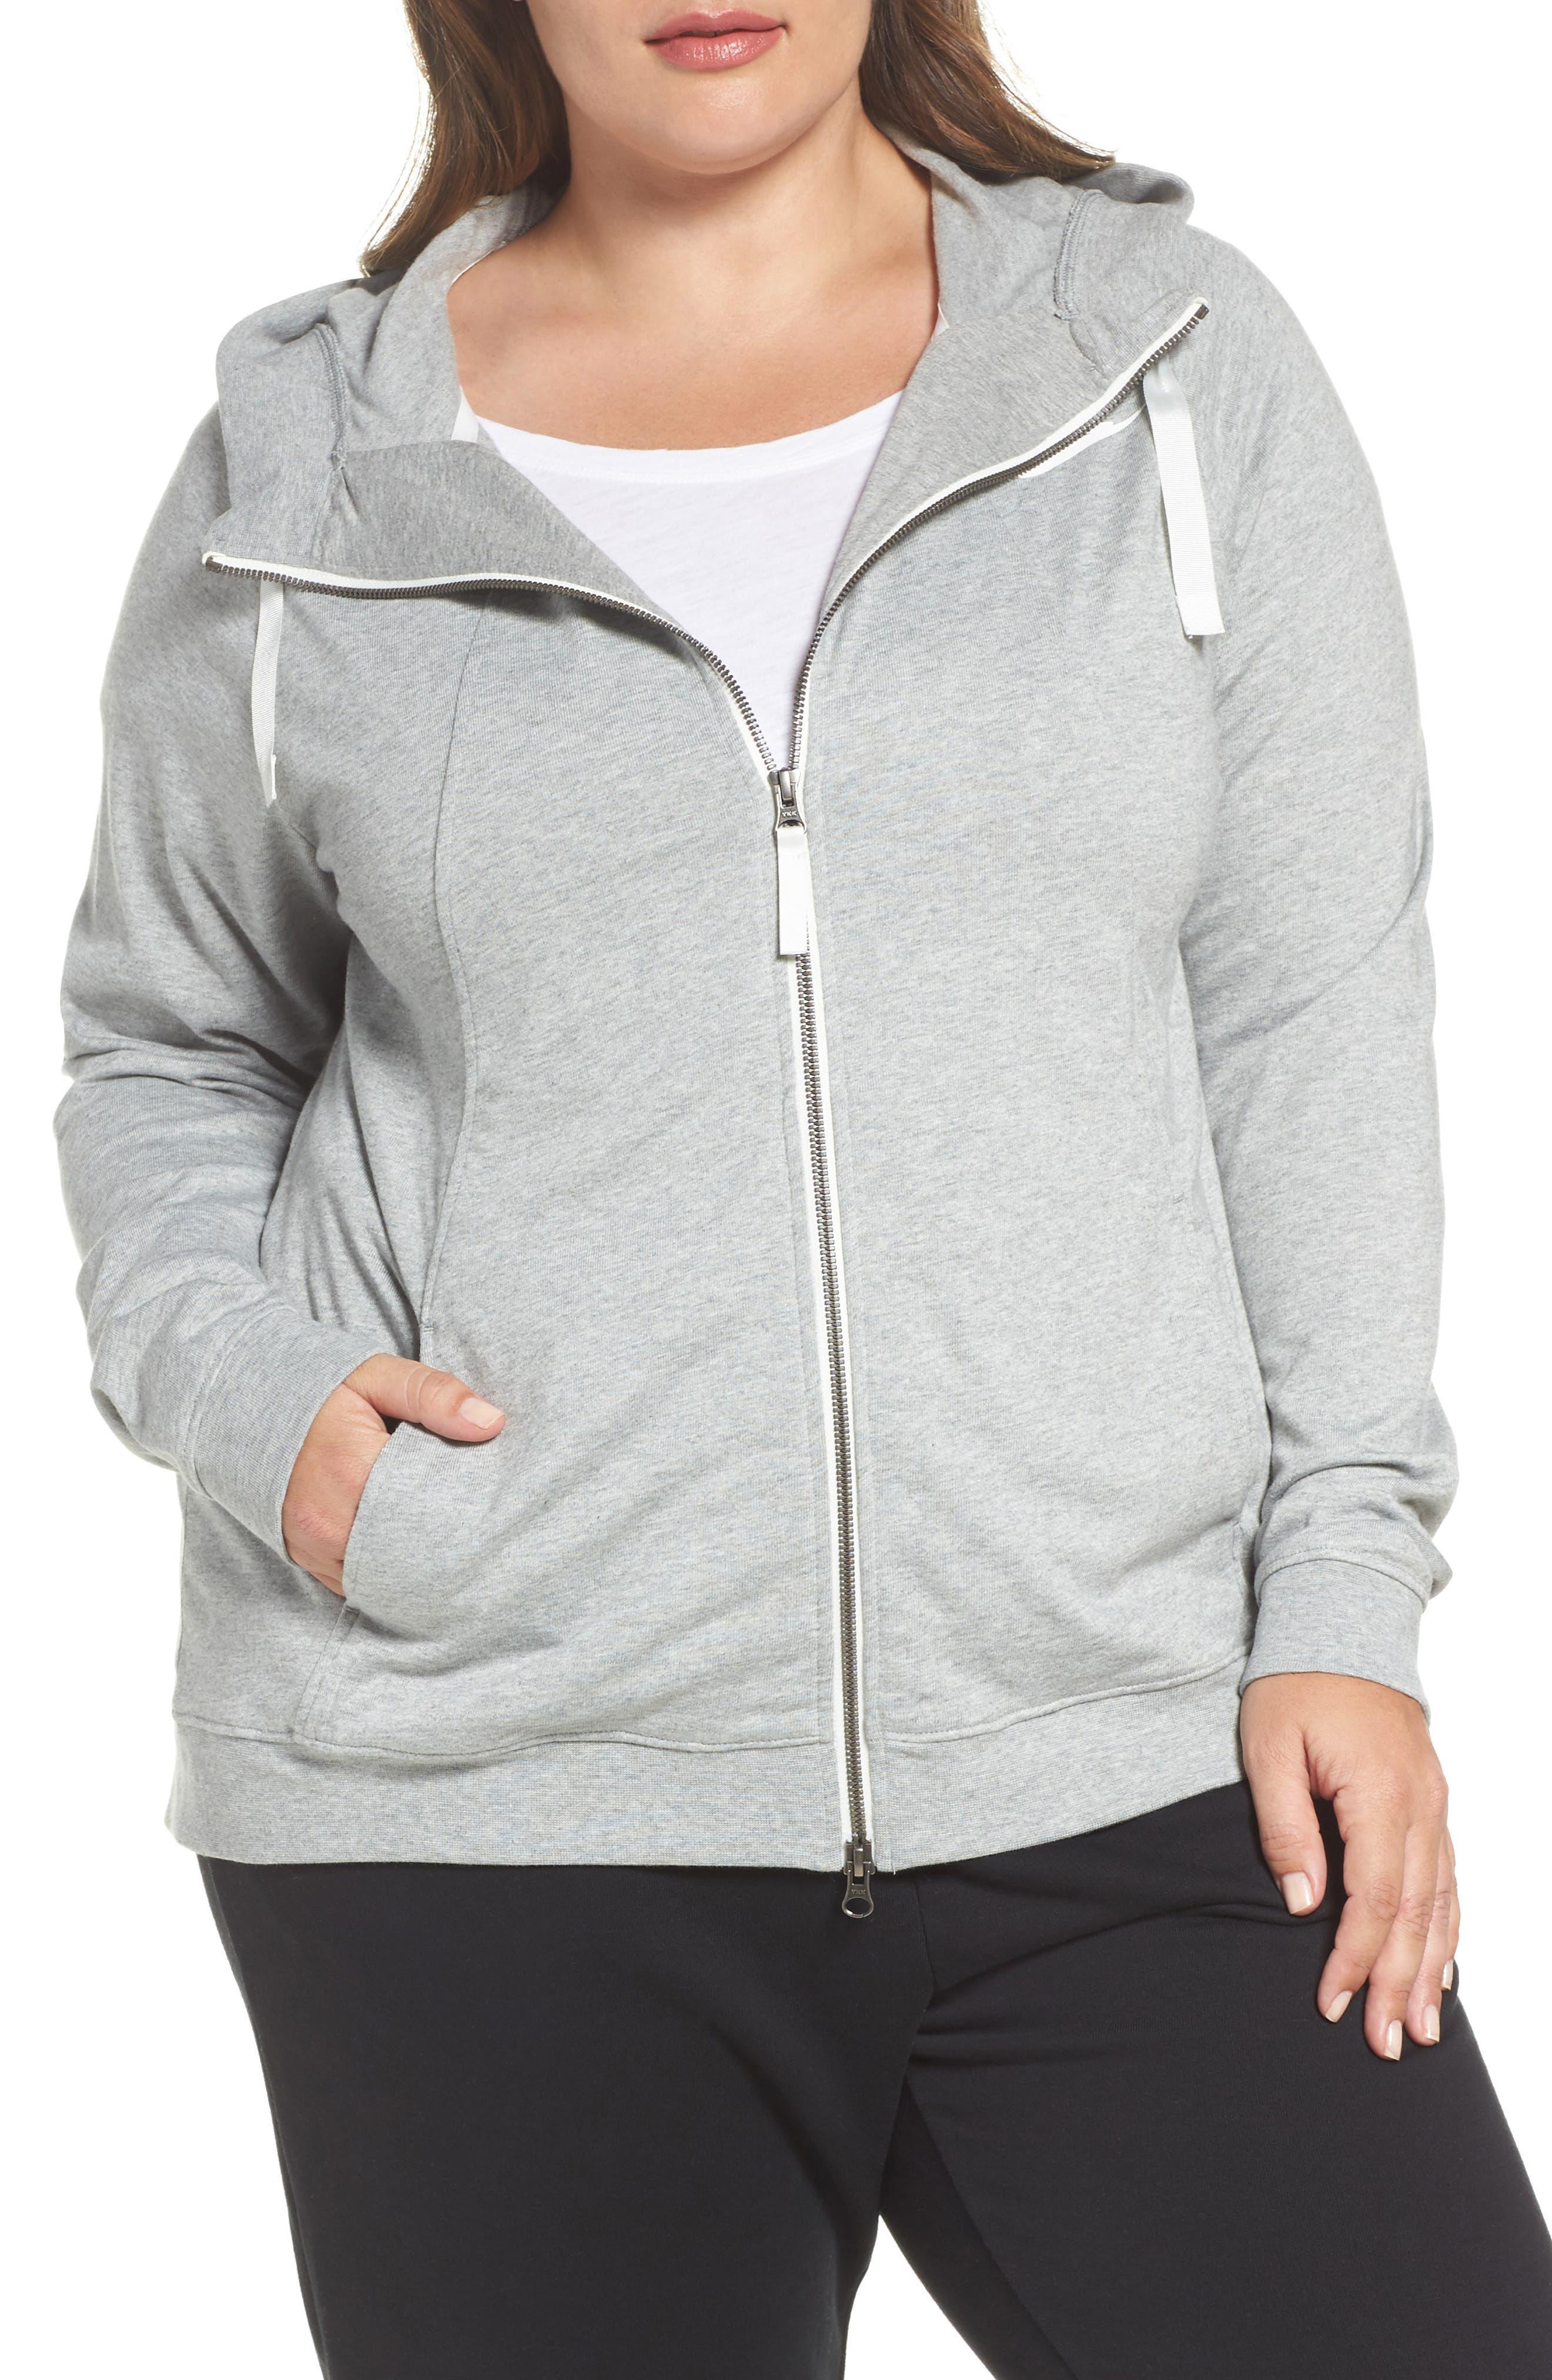 Main Image - Nike Sportswear Gym Classic Hoodie (Plus Size)